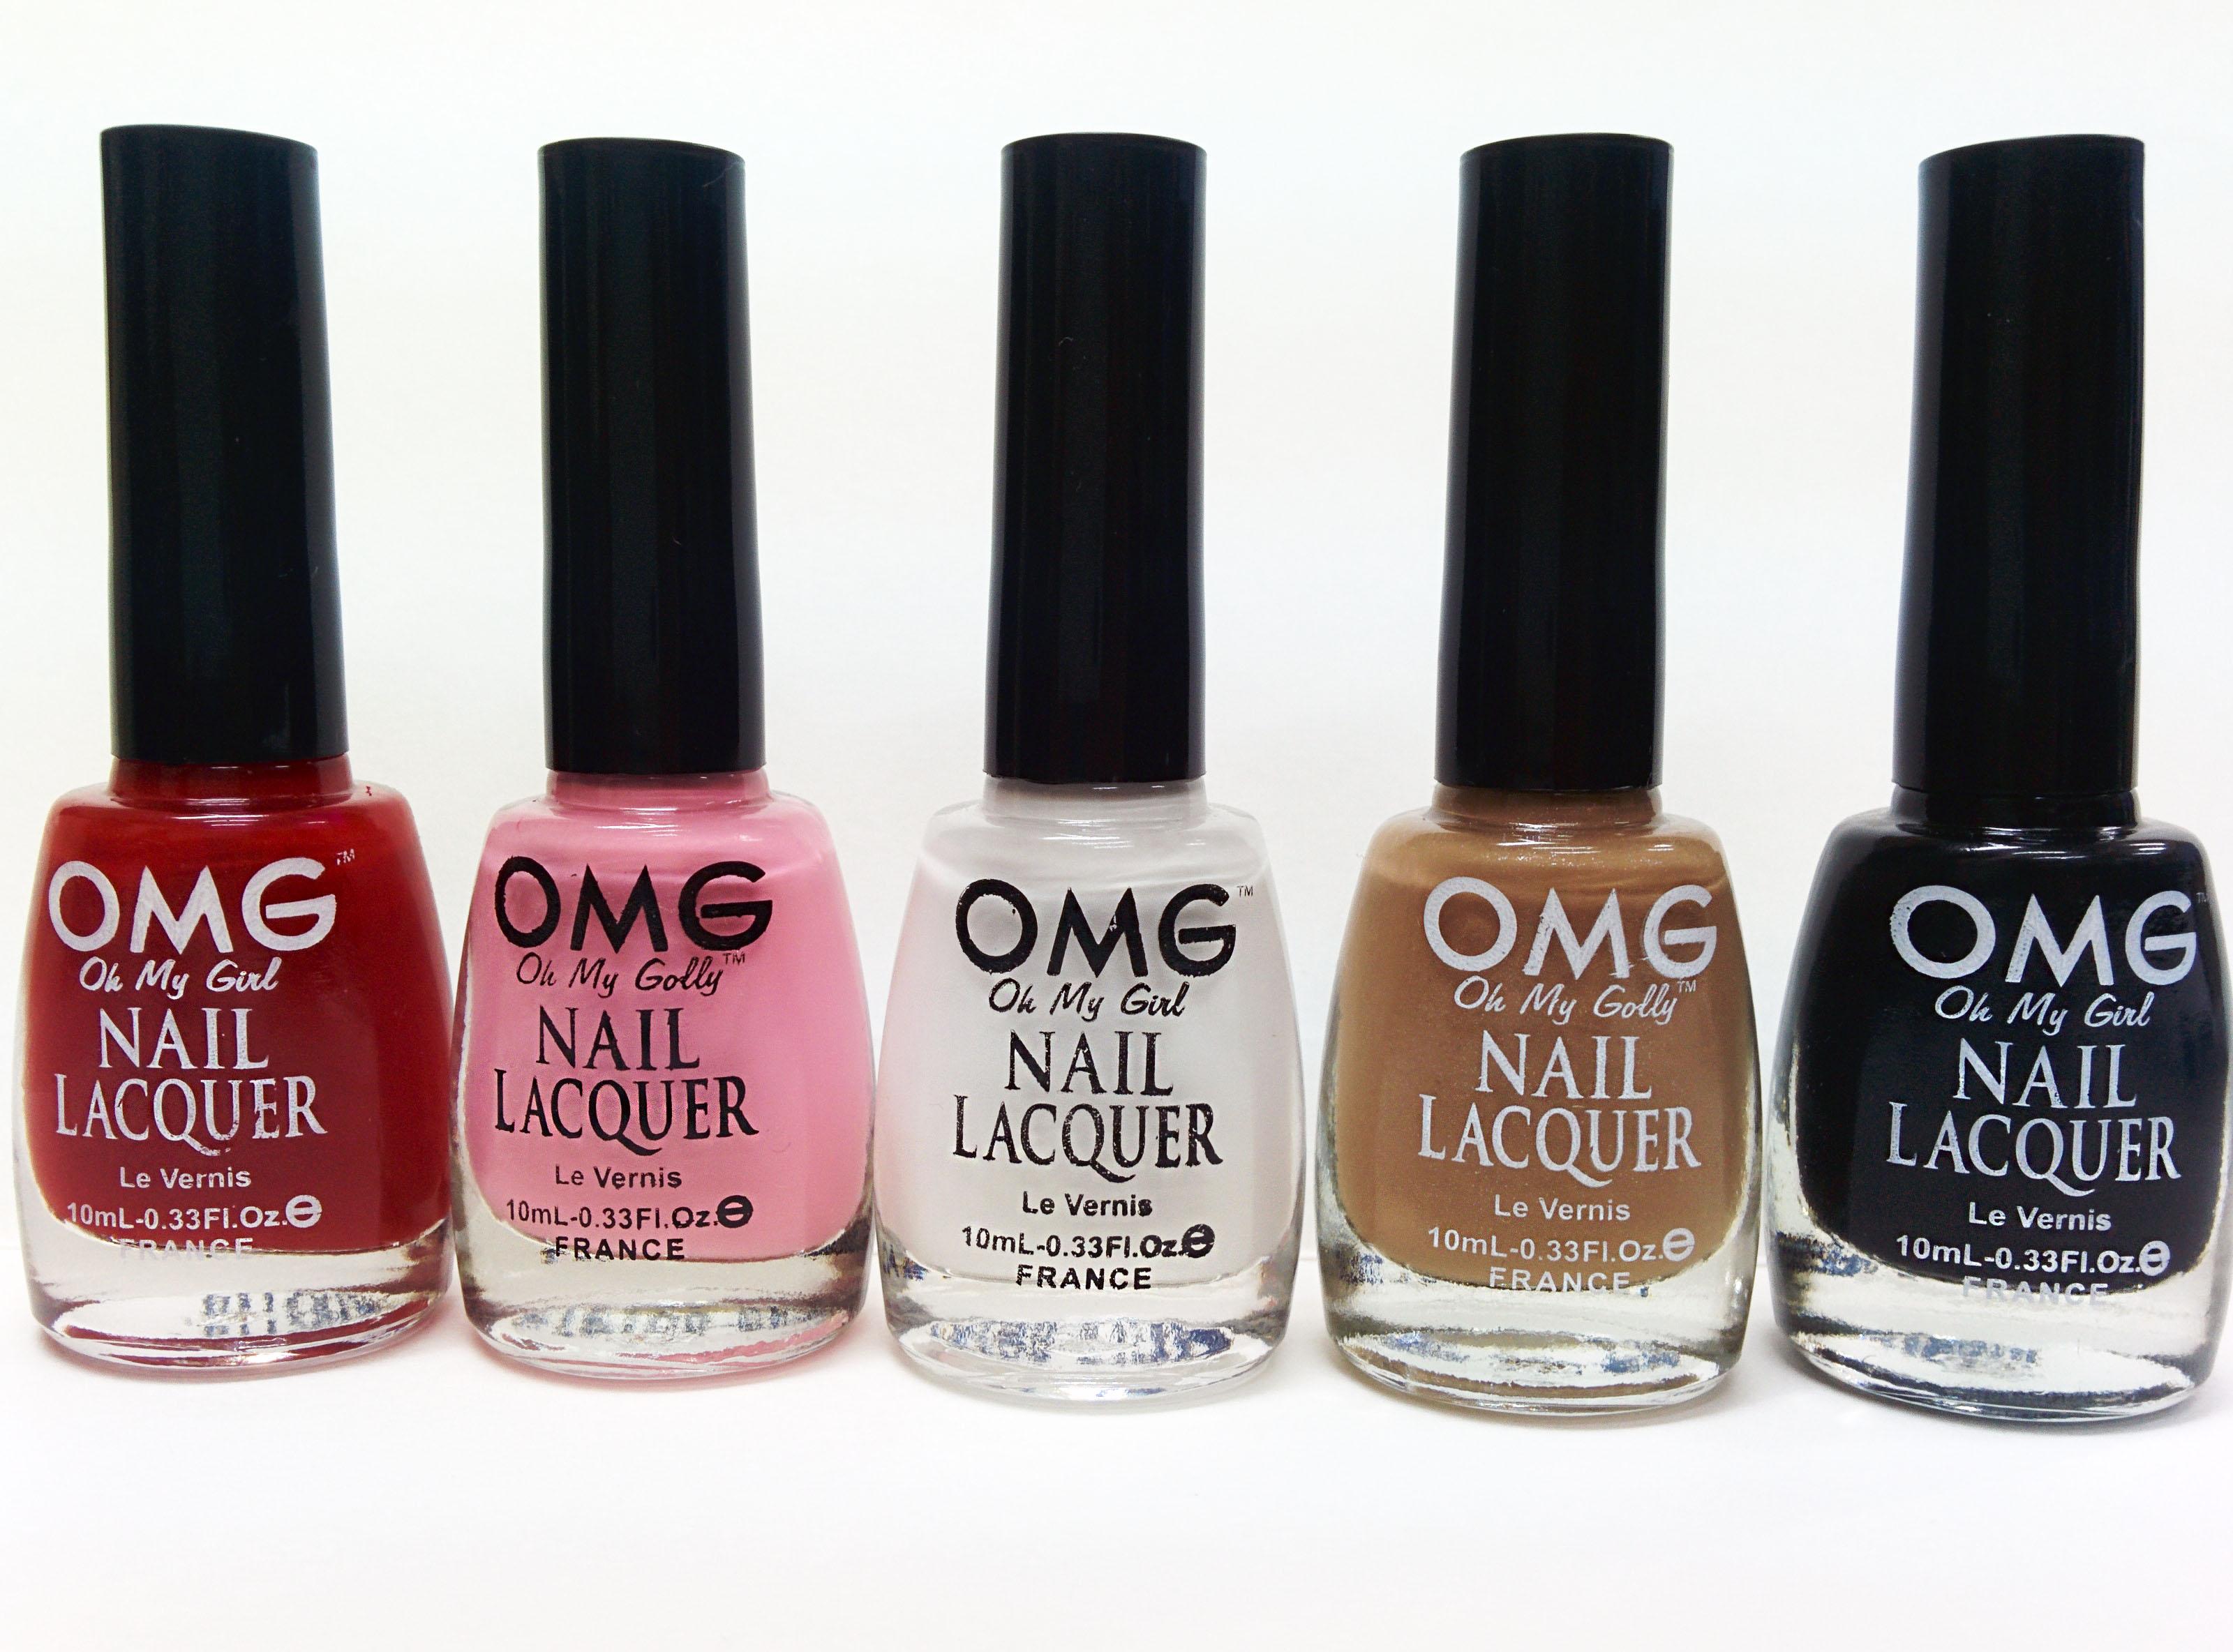 Top 5 Must-Have Nail Polish Colors